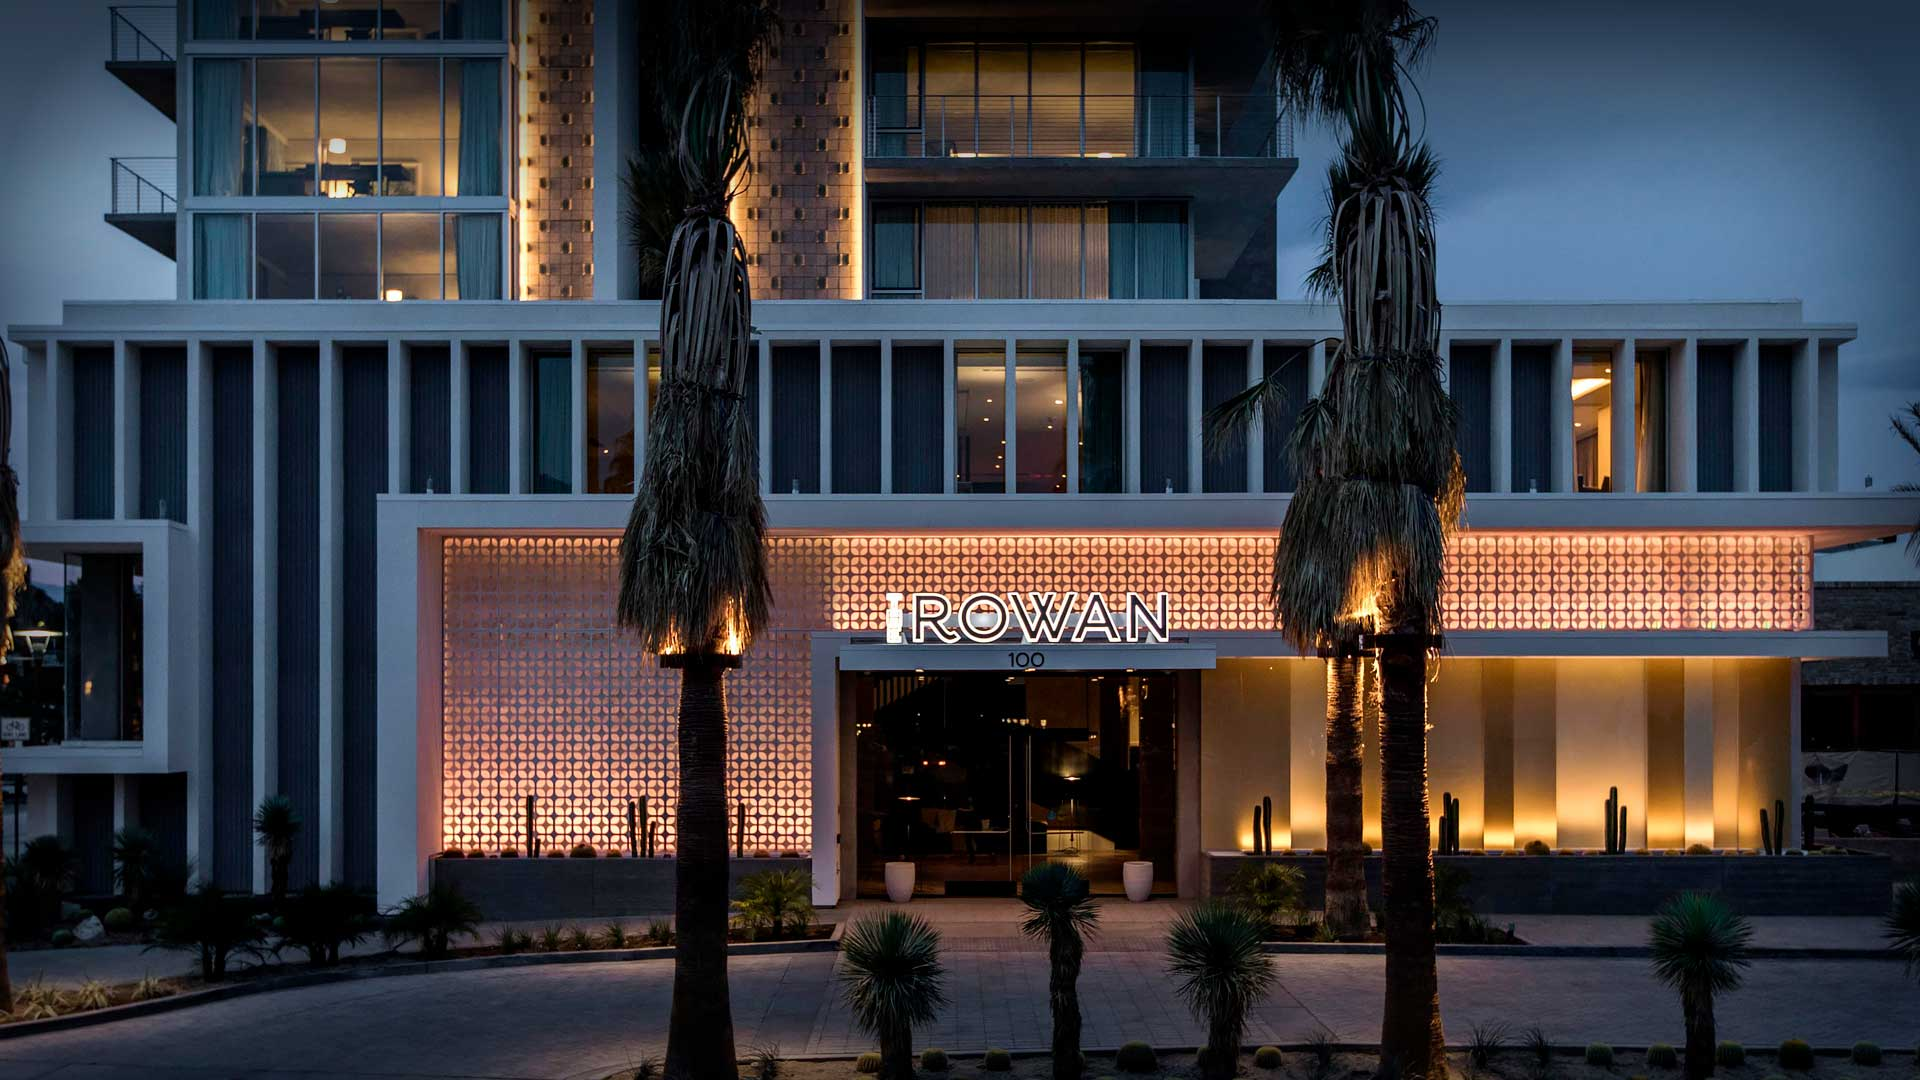 kimpton-rowan-hotel-1920×1080-01a